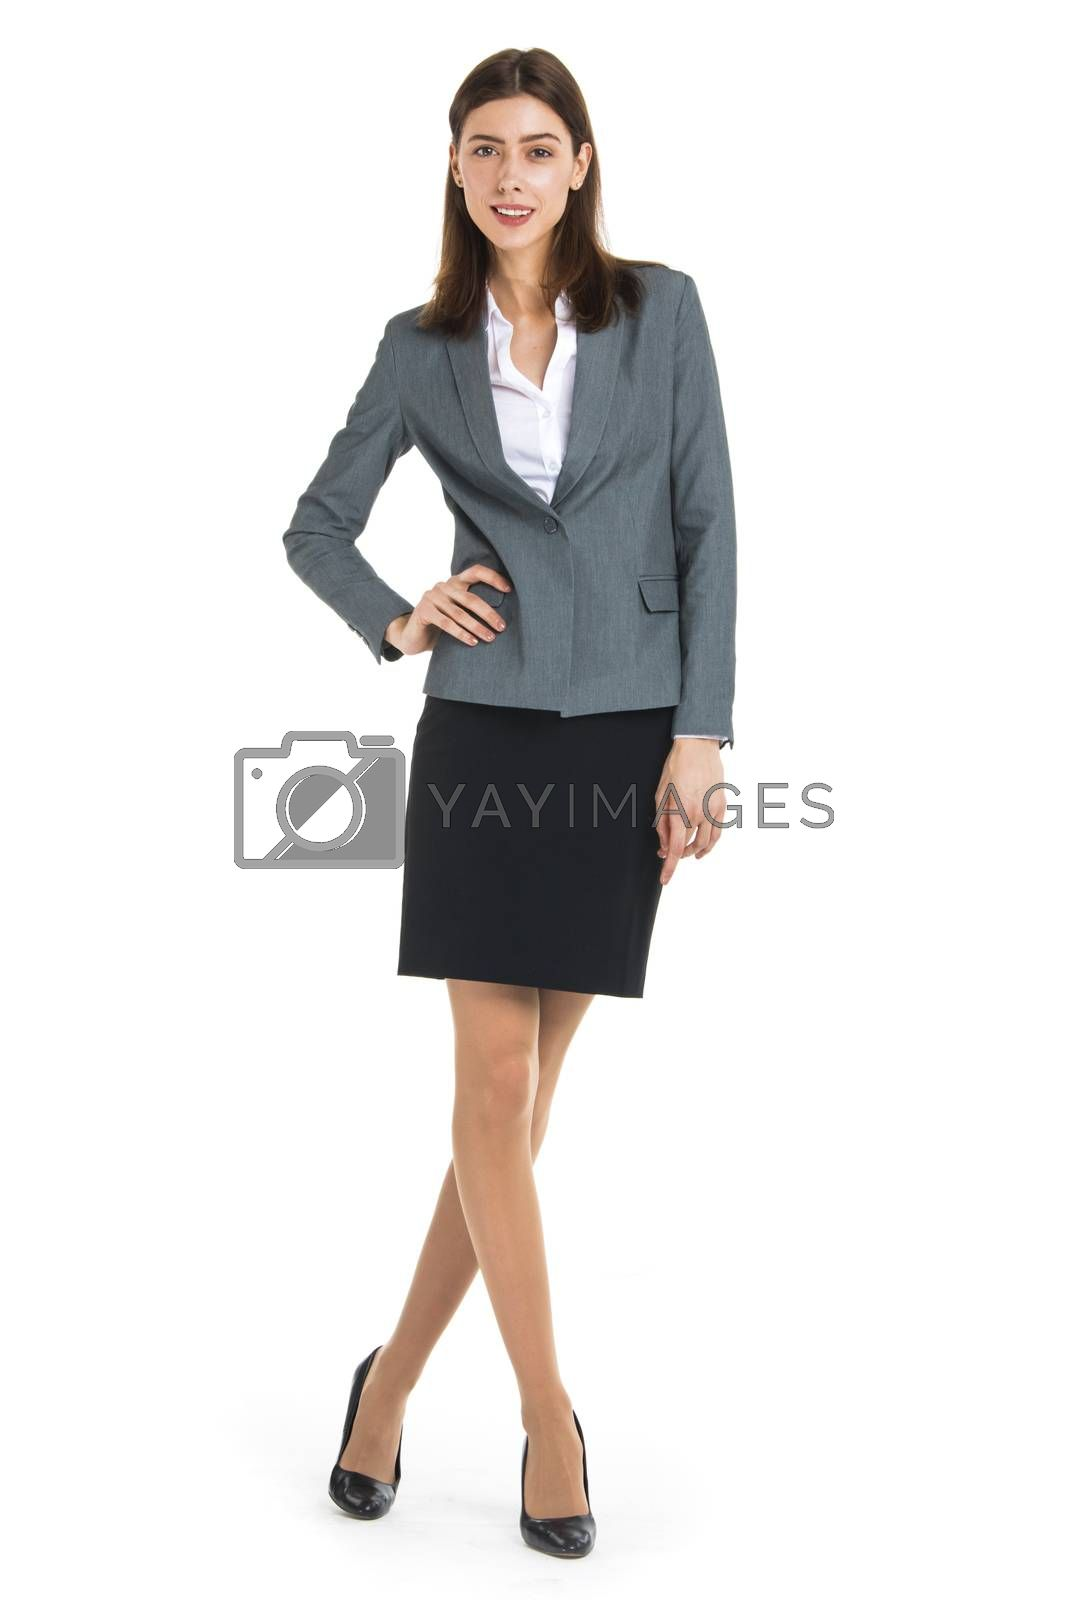 Businesswoman portrait full length studio isolated on white background